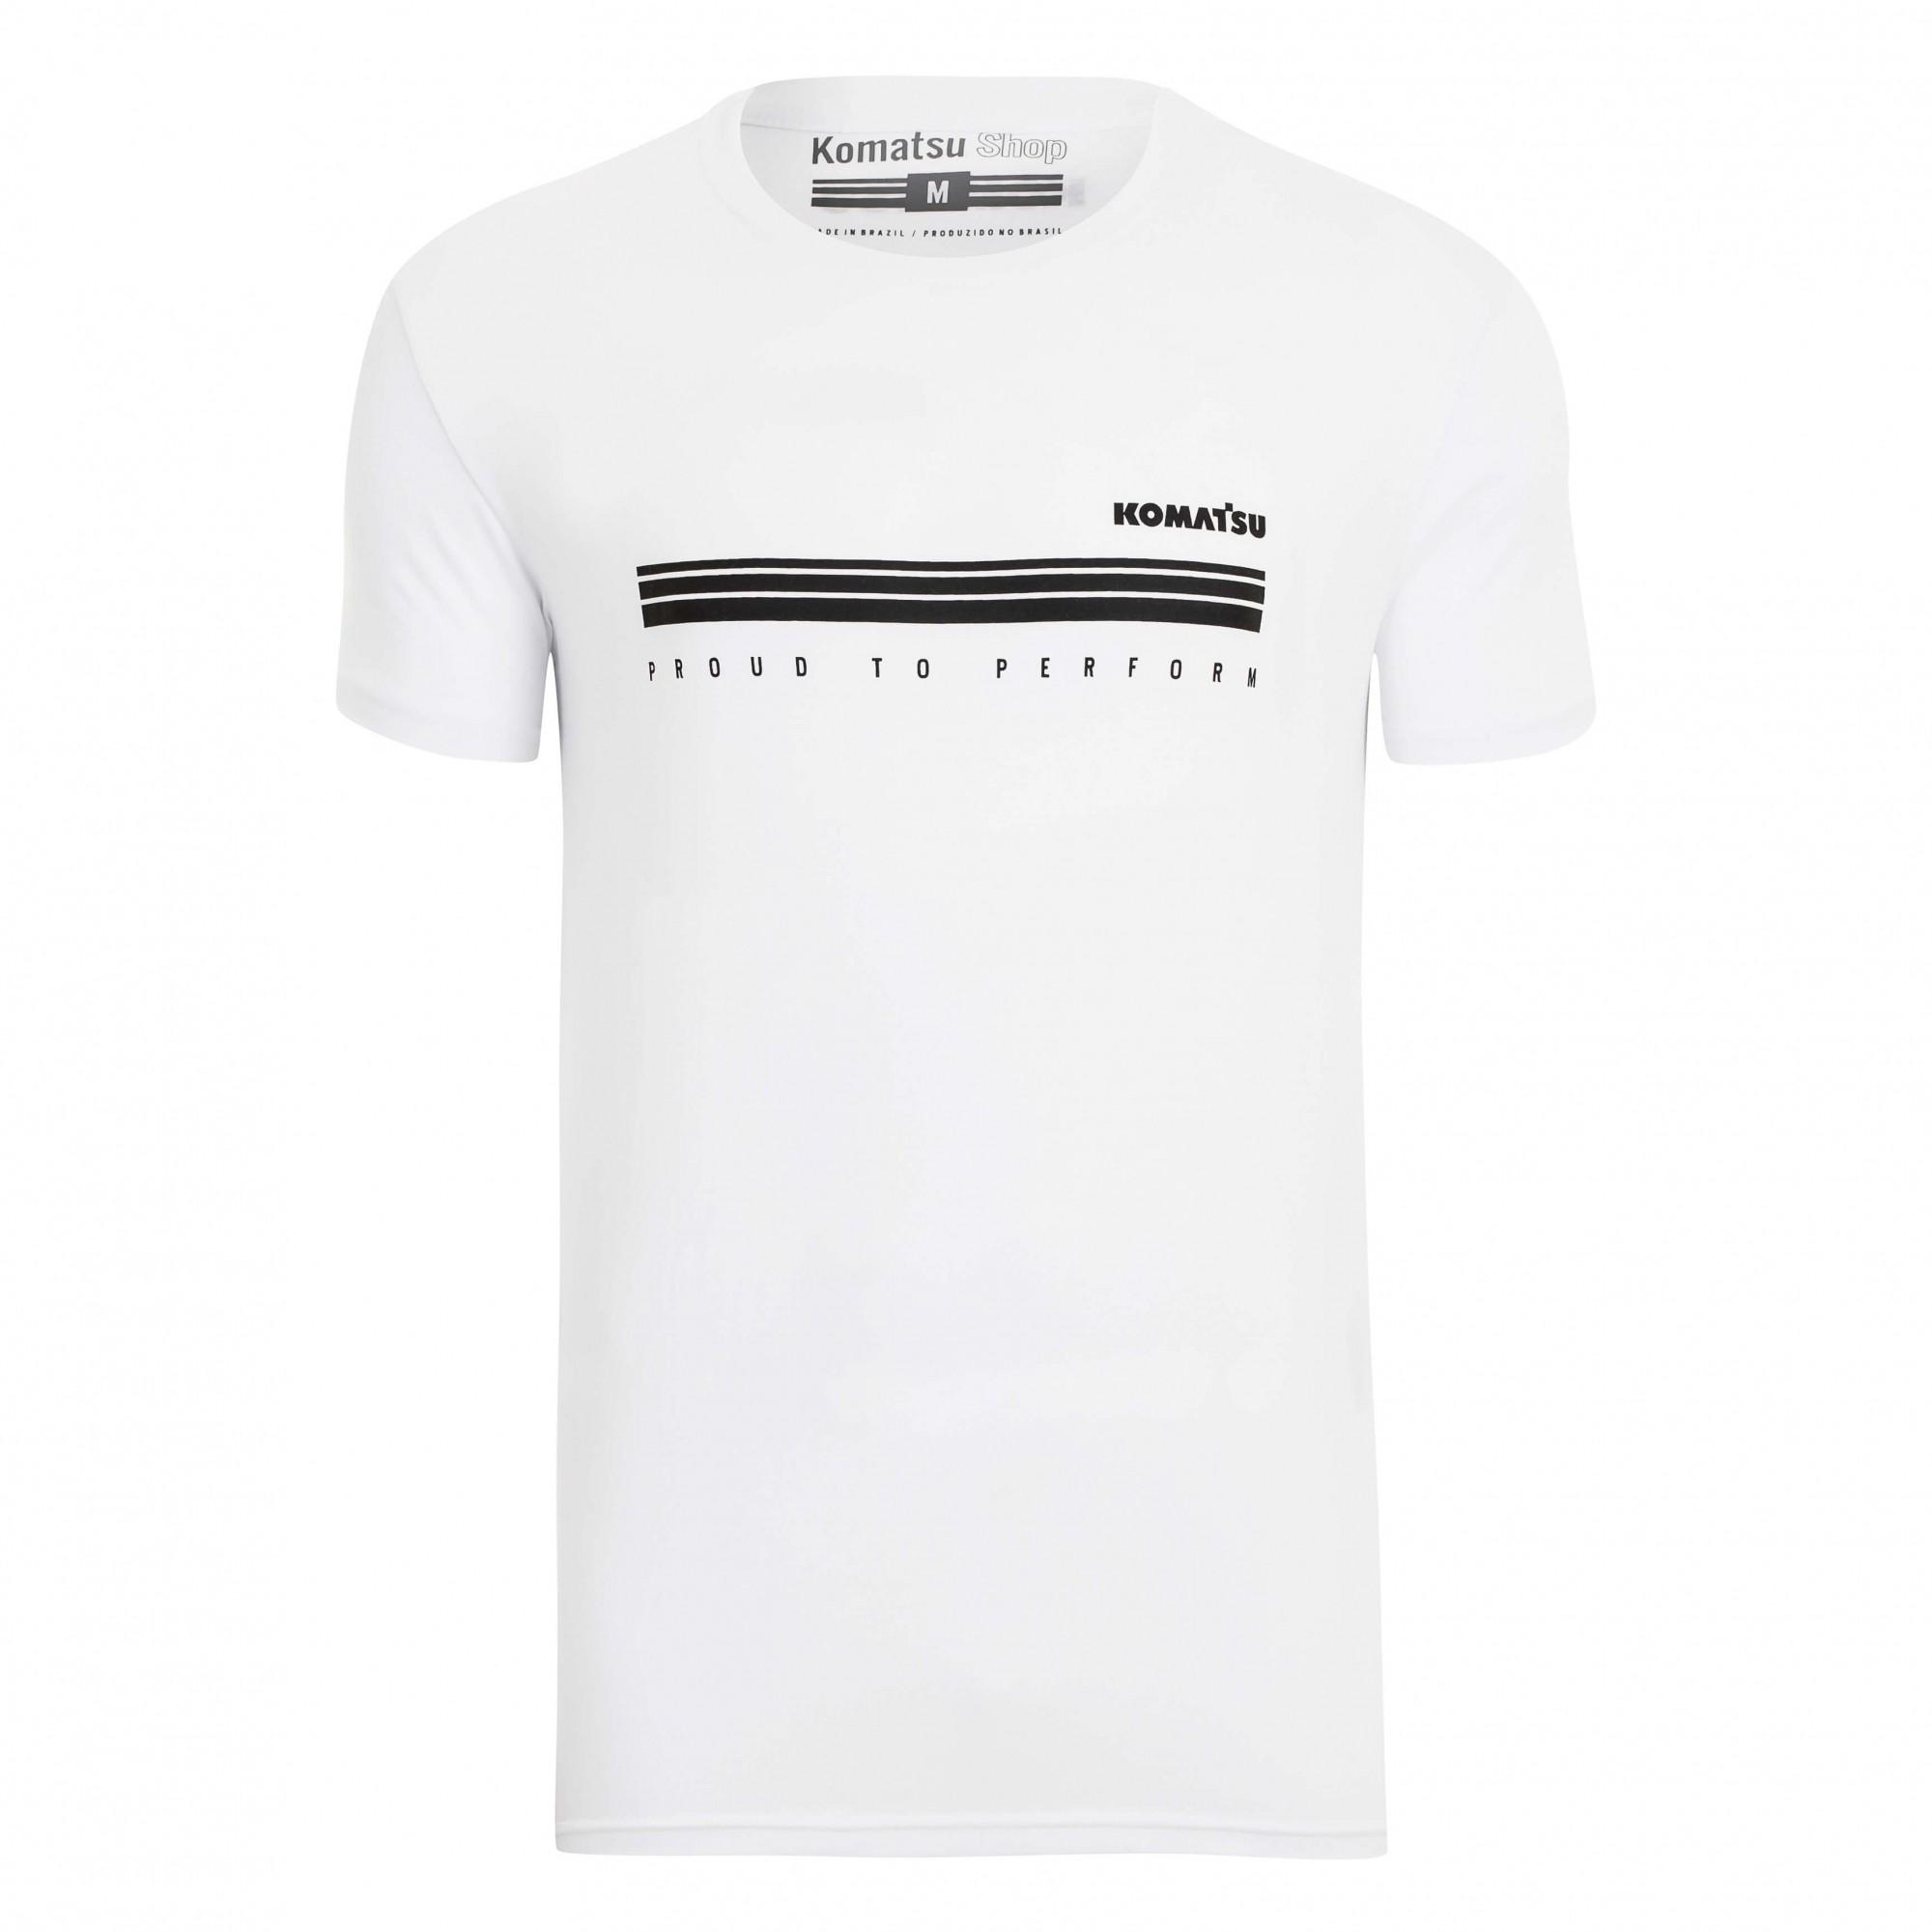 Camiseta Masc. KOMATSU Perform